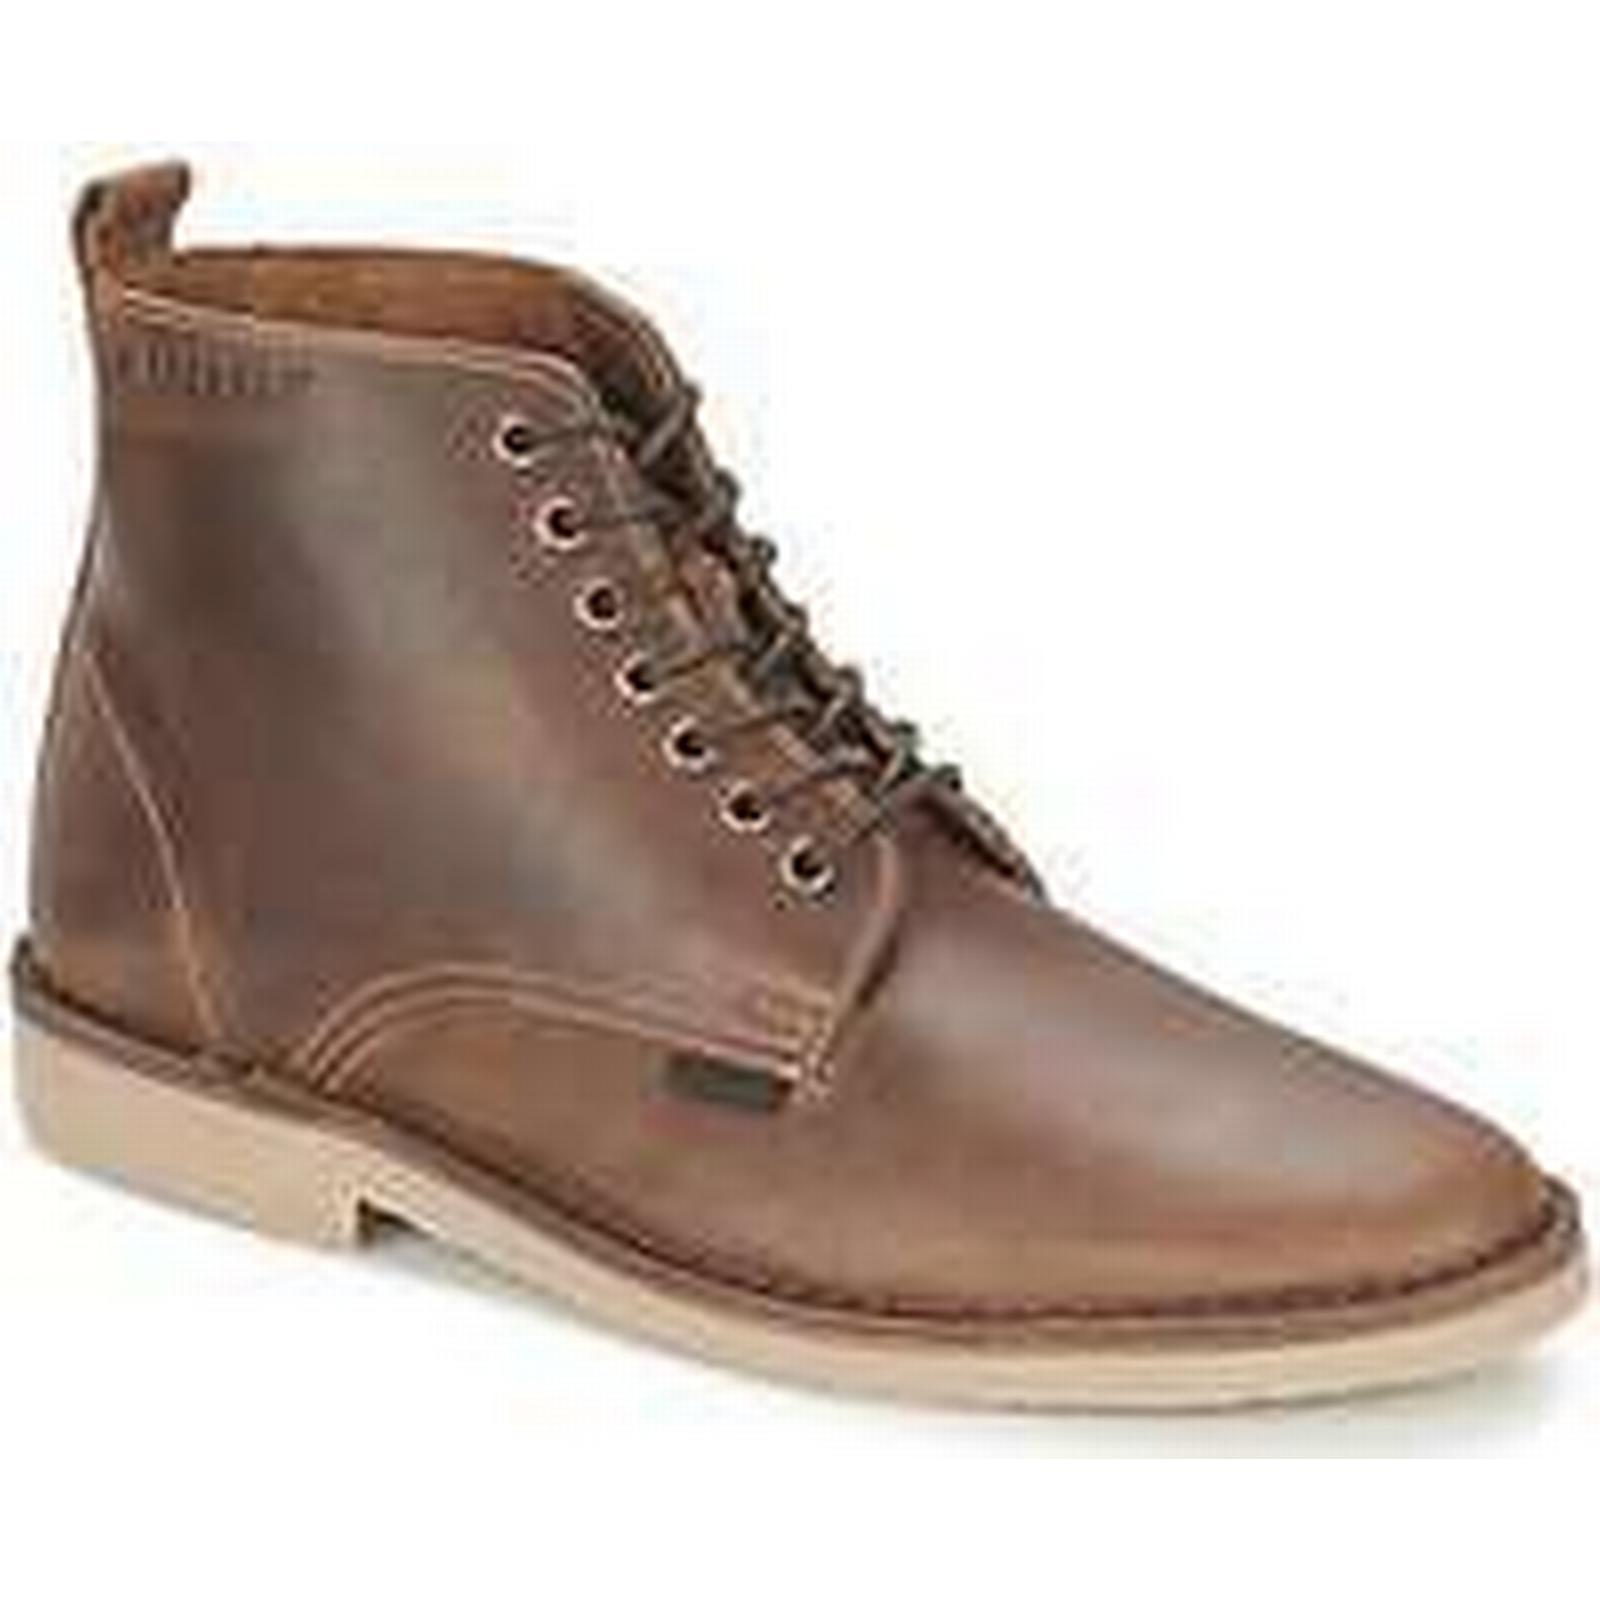 Spartoo.co.uk Ben Sherman OLEG 7 Boots EYELET BOOT men's Mid Boots 7 in Brown 349ed7